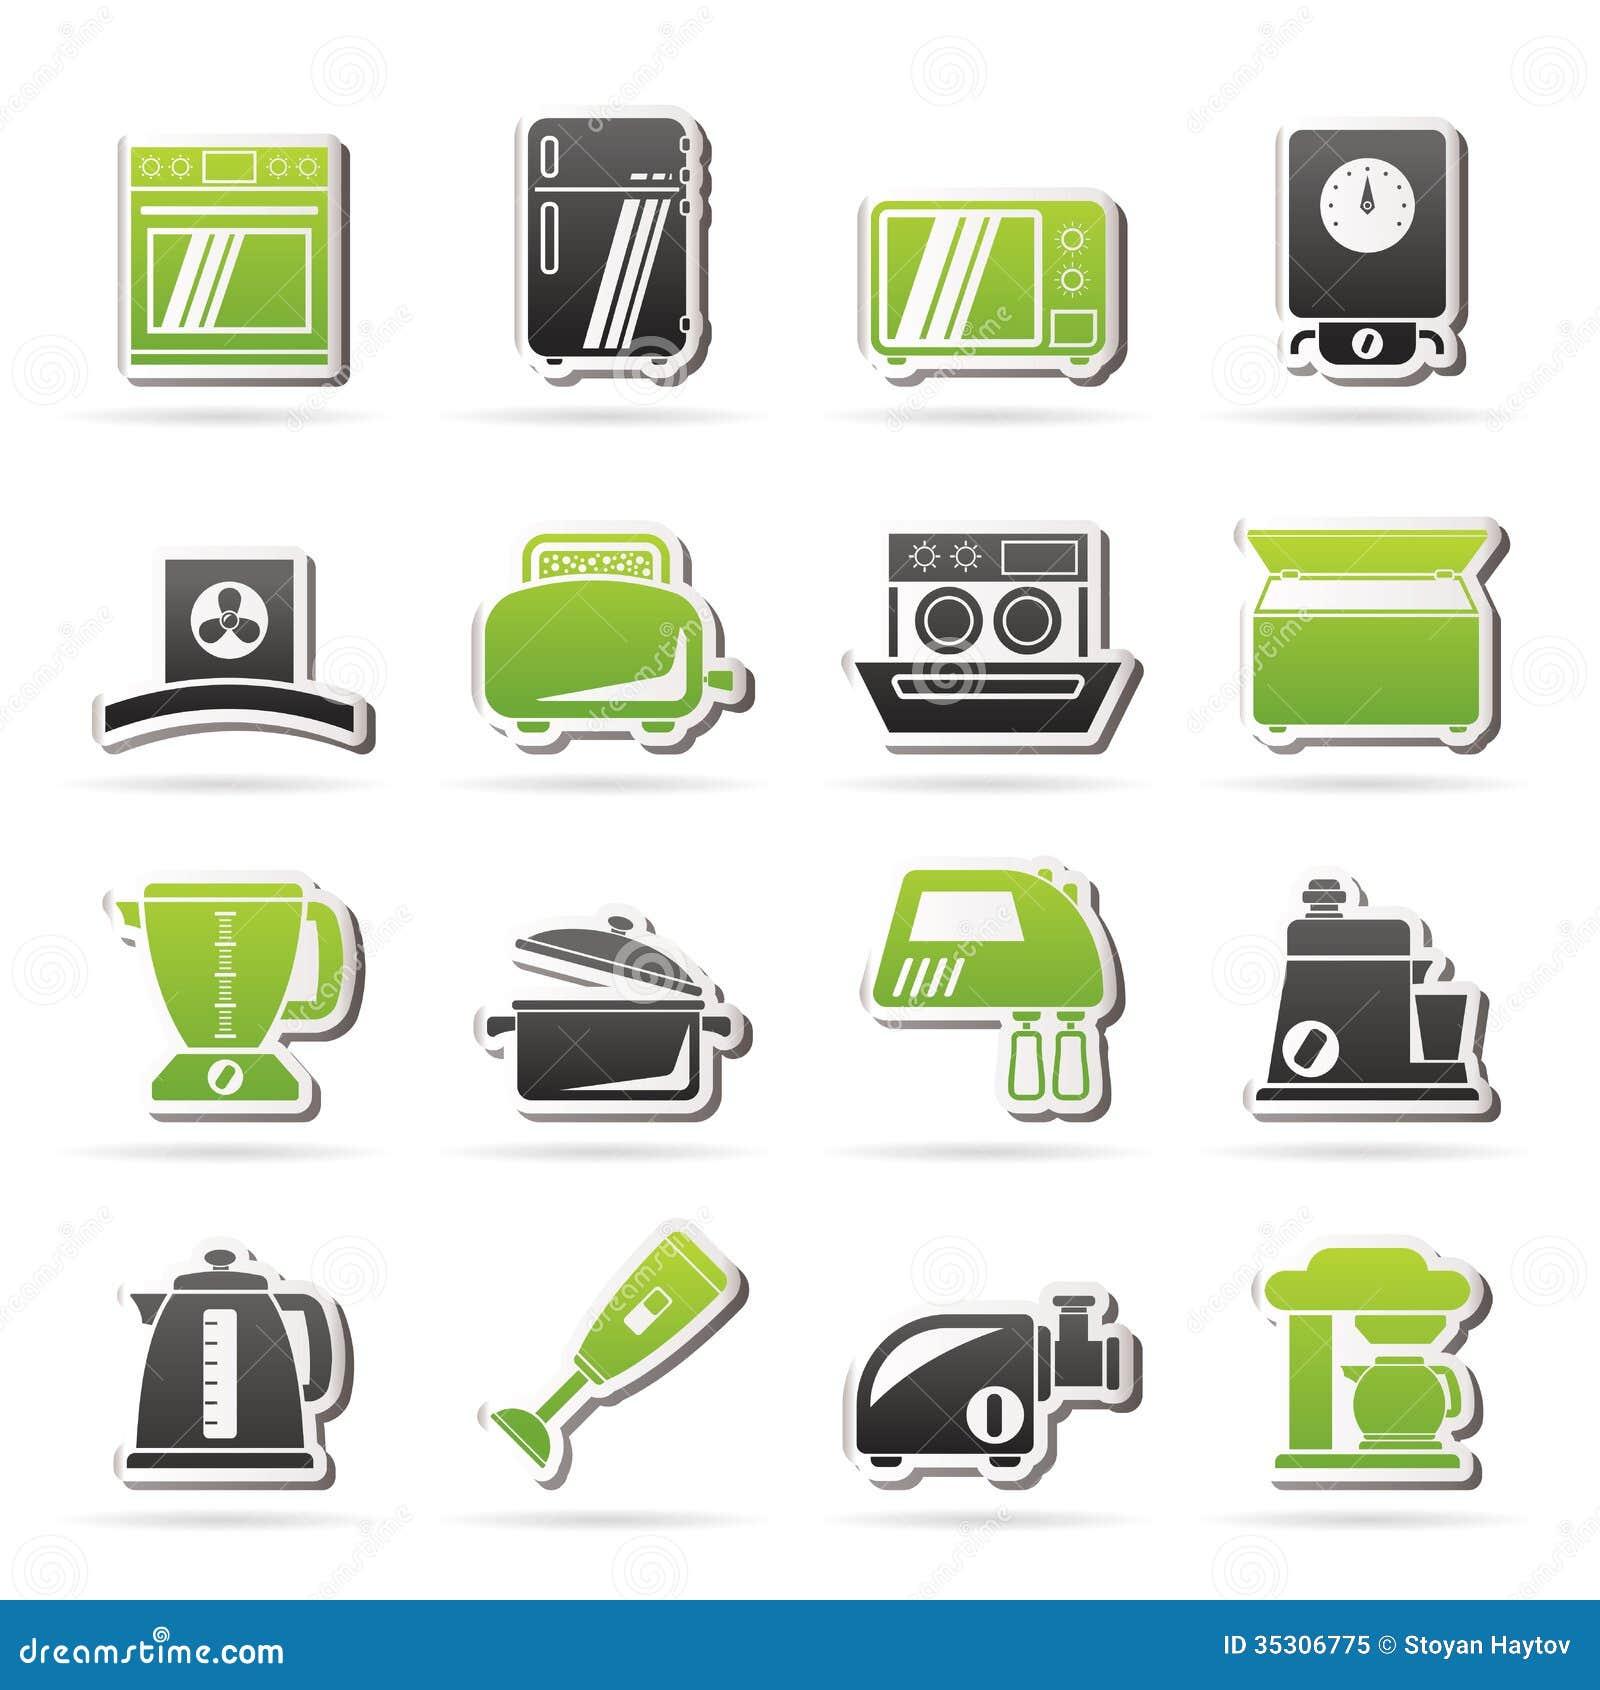 Uncategorized Free Kitchen Appliances kitchen appliances and equipment icons royalty free stock photo